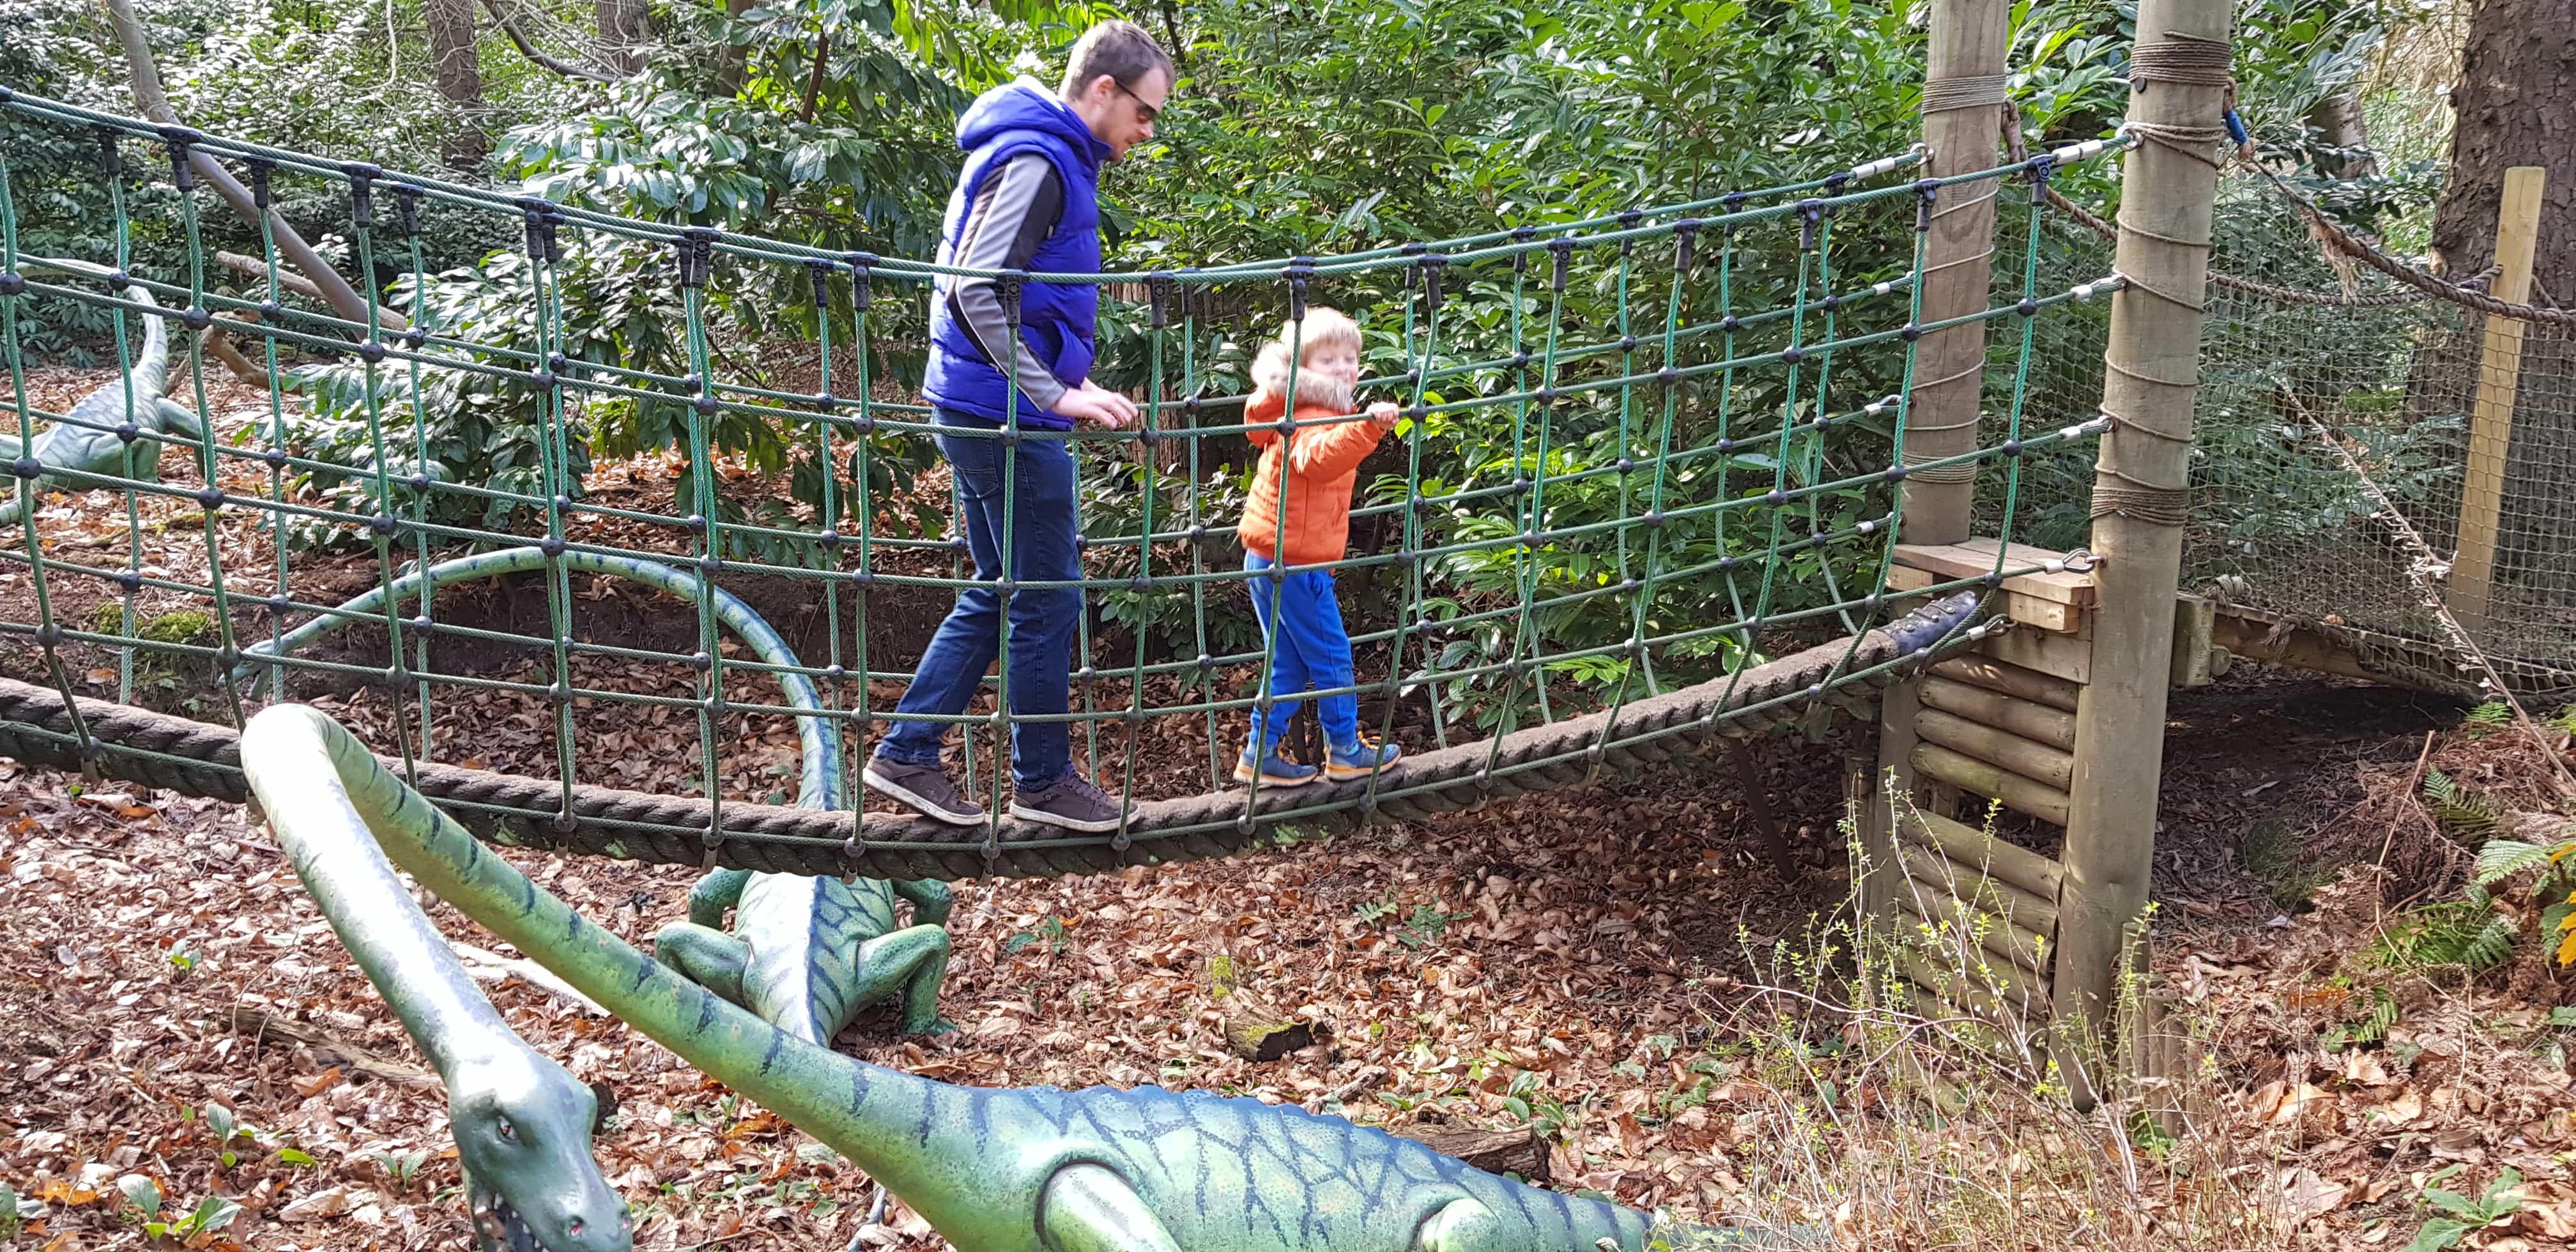 Roarr! Dinosaur Adventure Park